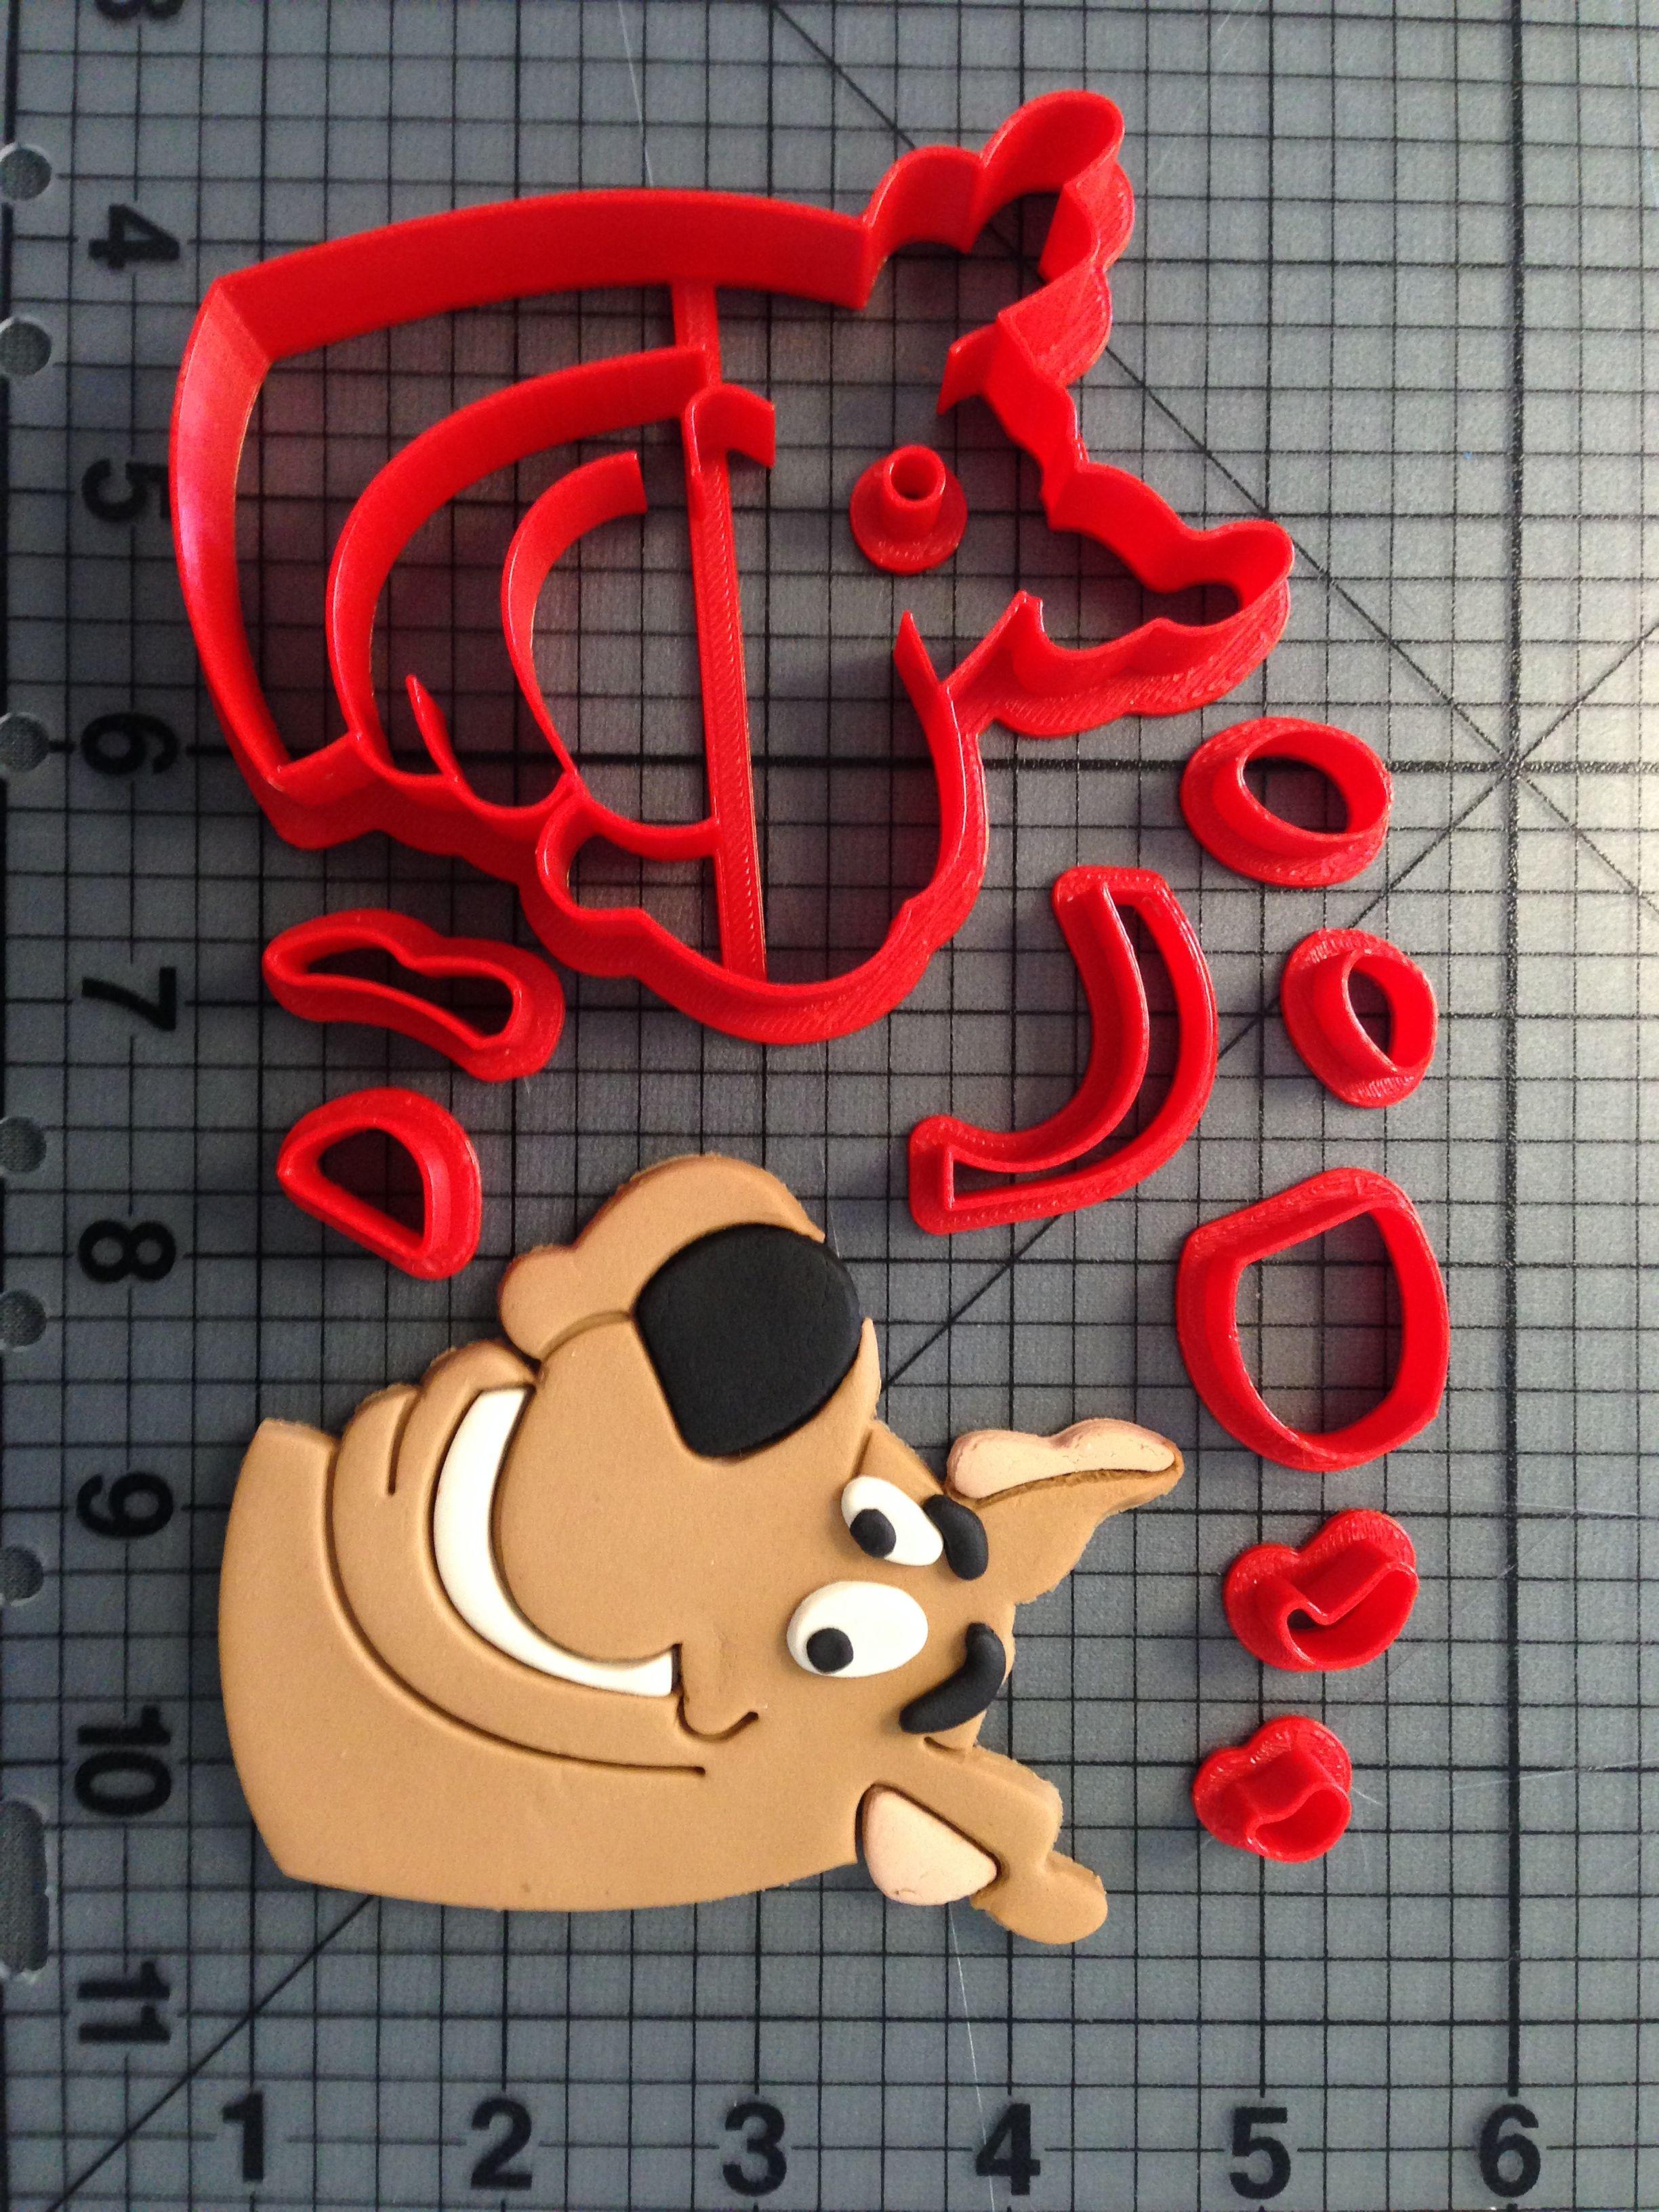 Scooby Doo – Scooby Cookie Cutter Set | Scooby doo | Pinterest ...